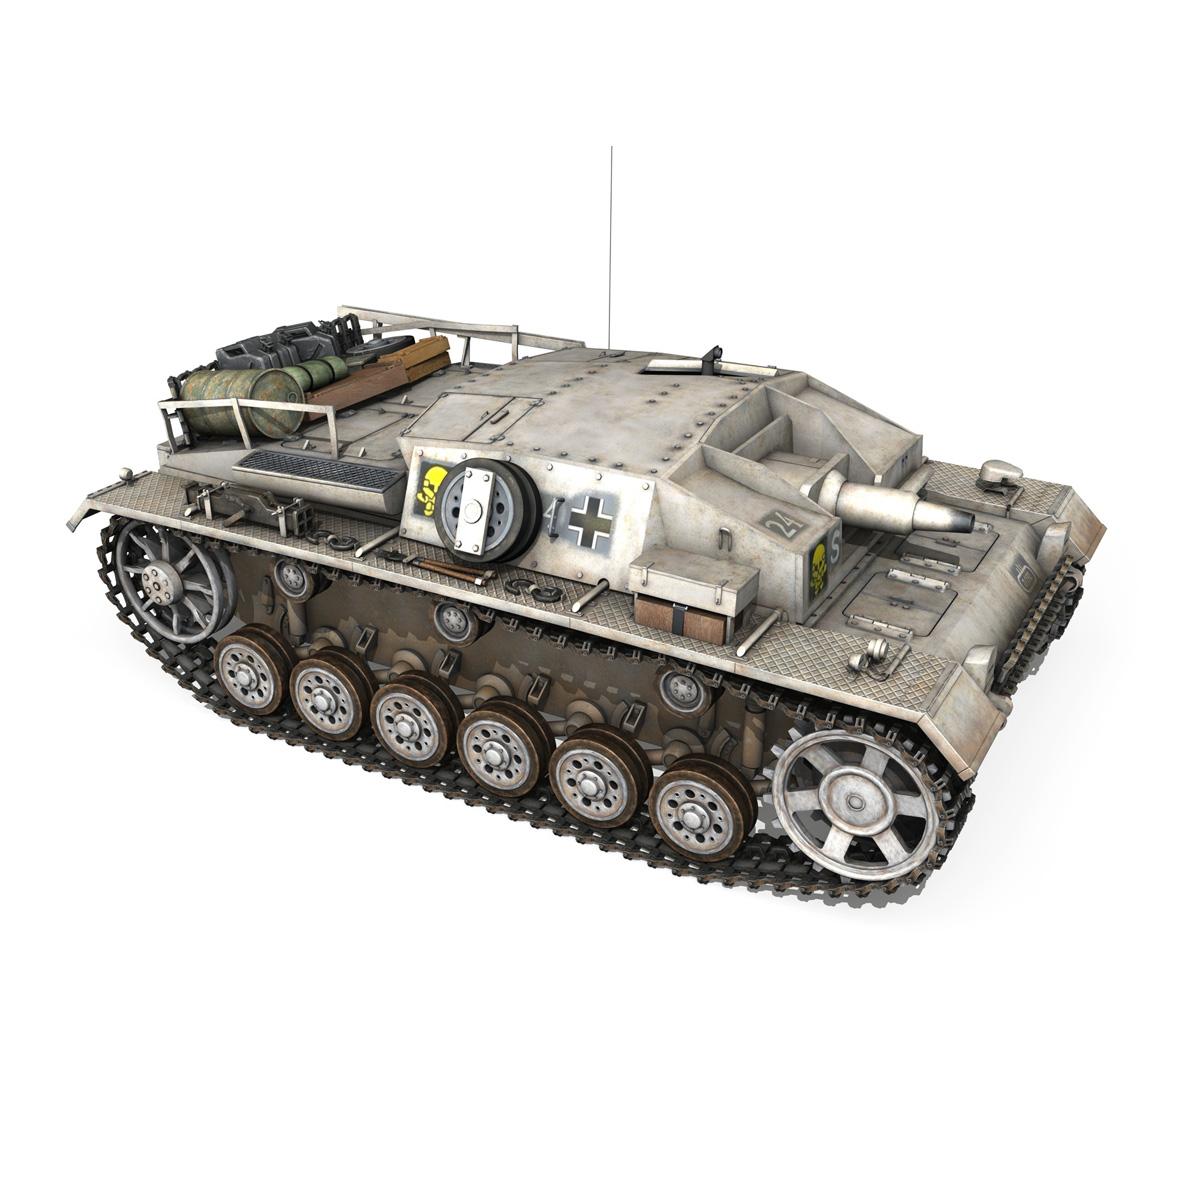 stug iii – ausf.d – stug abt 192 – winter camo 3d model 3ds fbx lwo lw lws obj c4d 265227